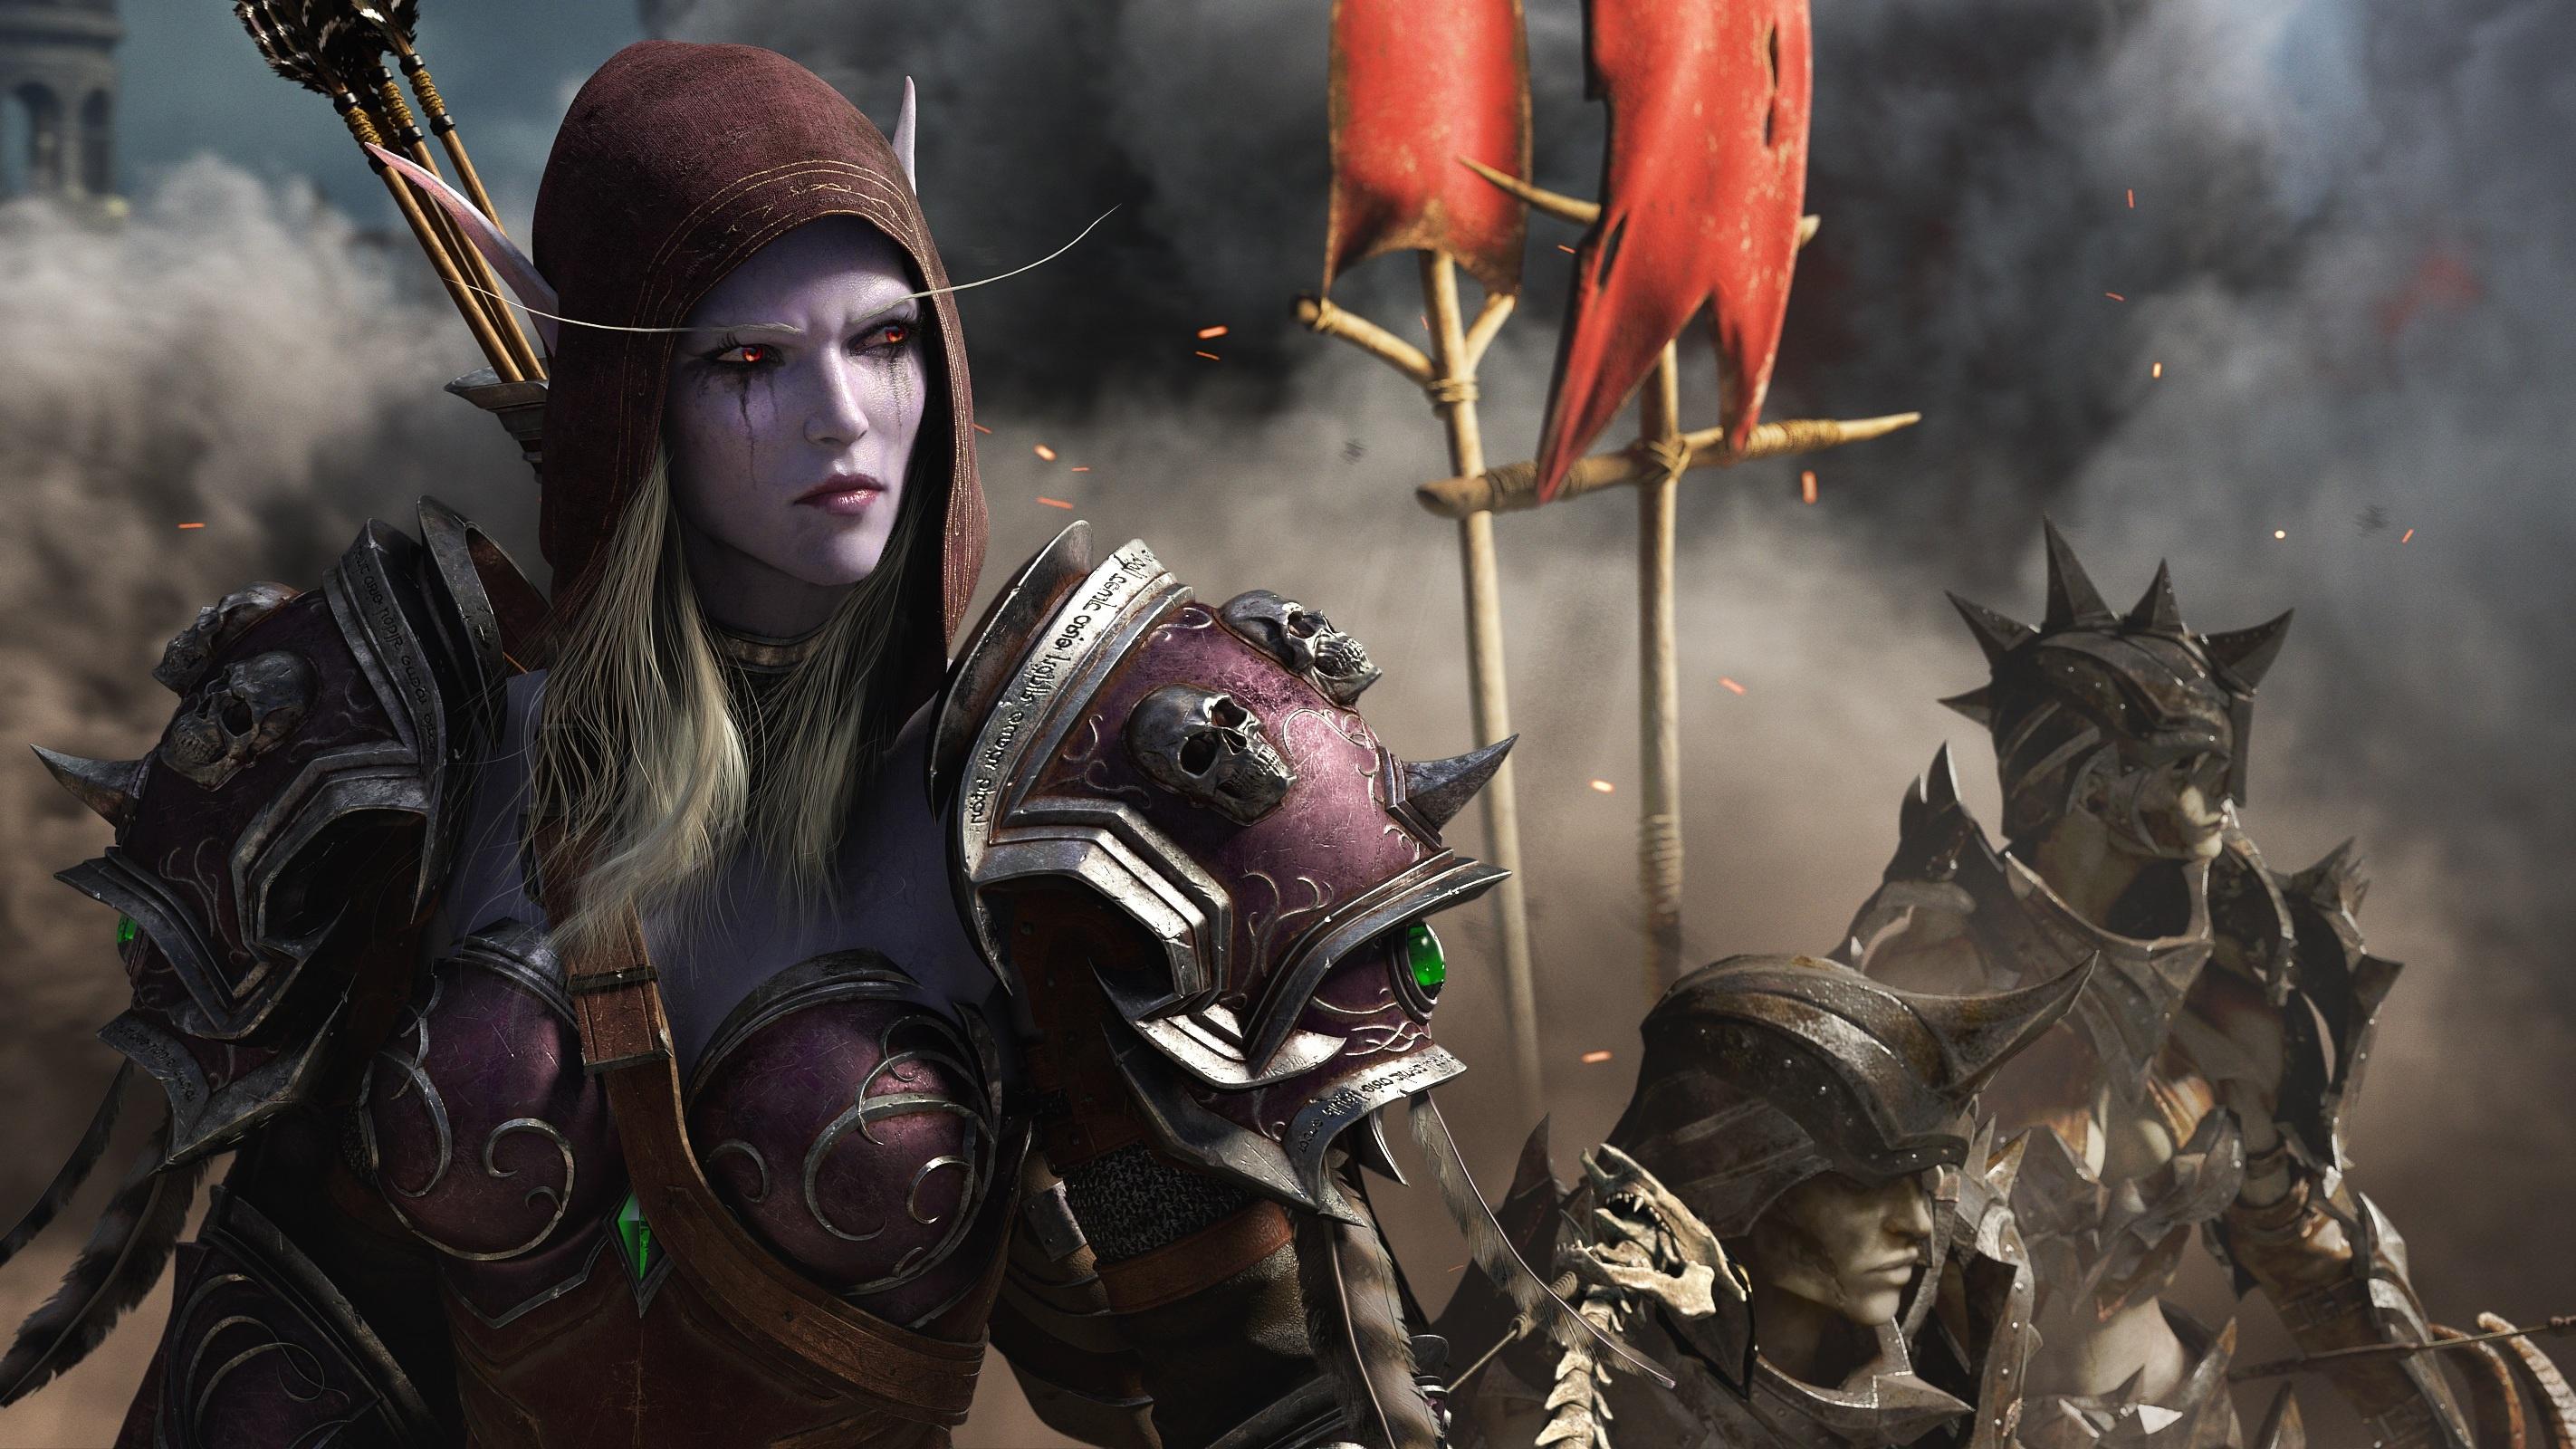 World Of Warcraft Wallpaper Bfa: World Of Warcraft: Battle For Azeroth HD Wallpaper